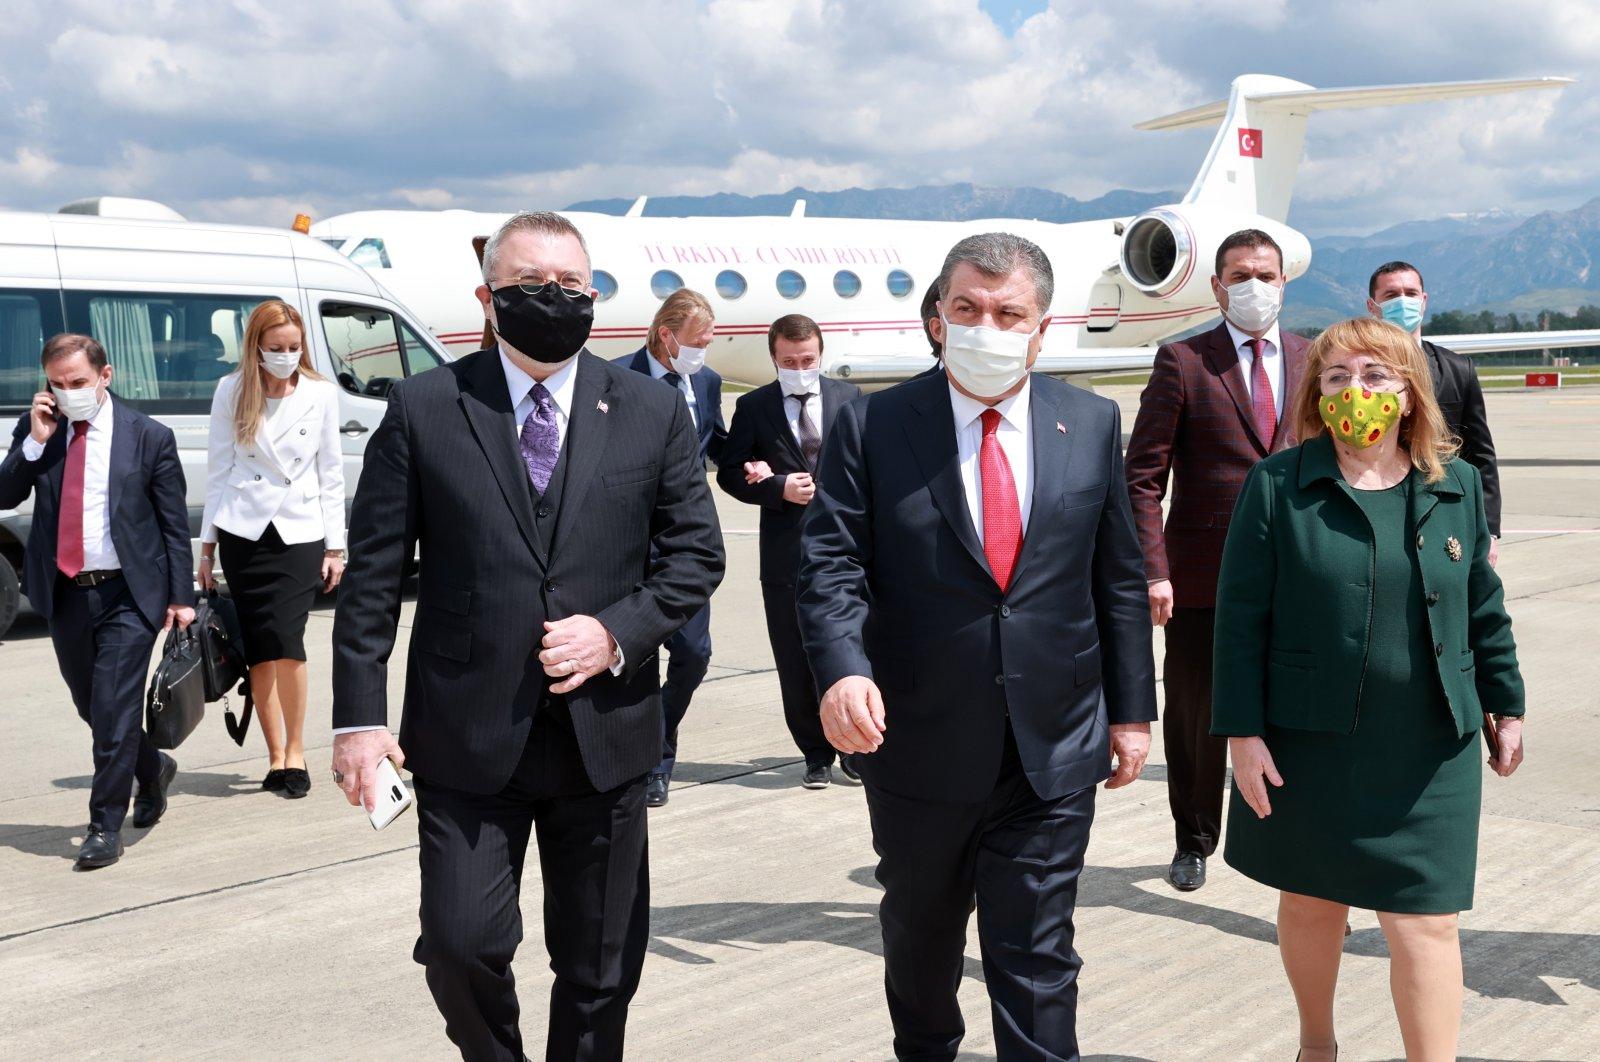 Turkey's Minister of Health Fahrettin Koca (C) landed in Albania for the opening ceremony of the Turkey-Albania Fier Regional Hospital, Albania, April 21, 2021. (AA Photo)